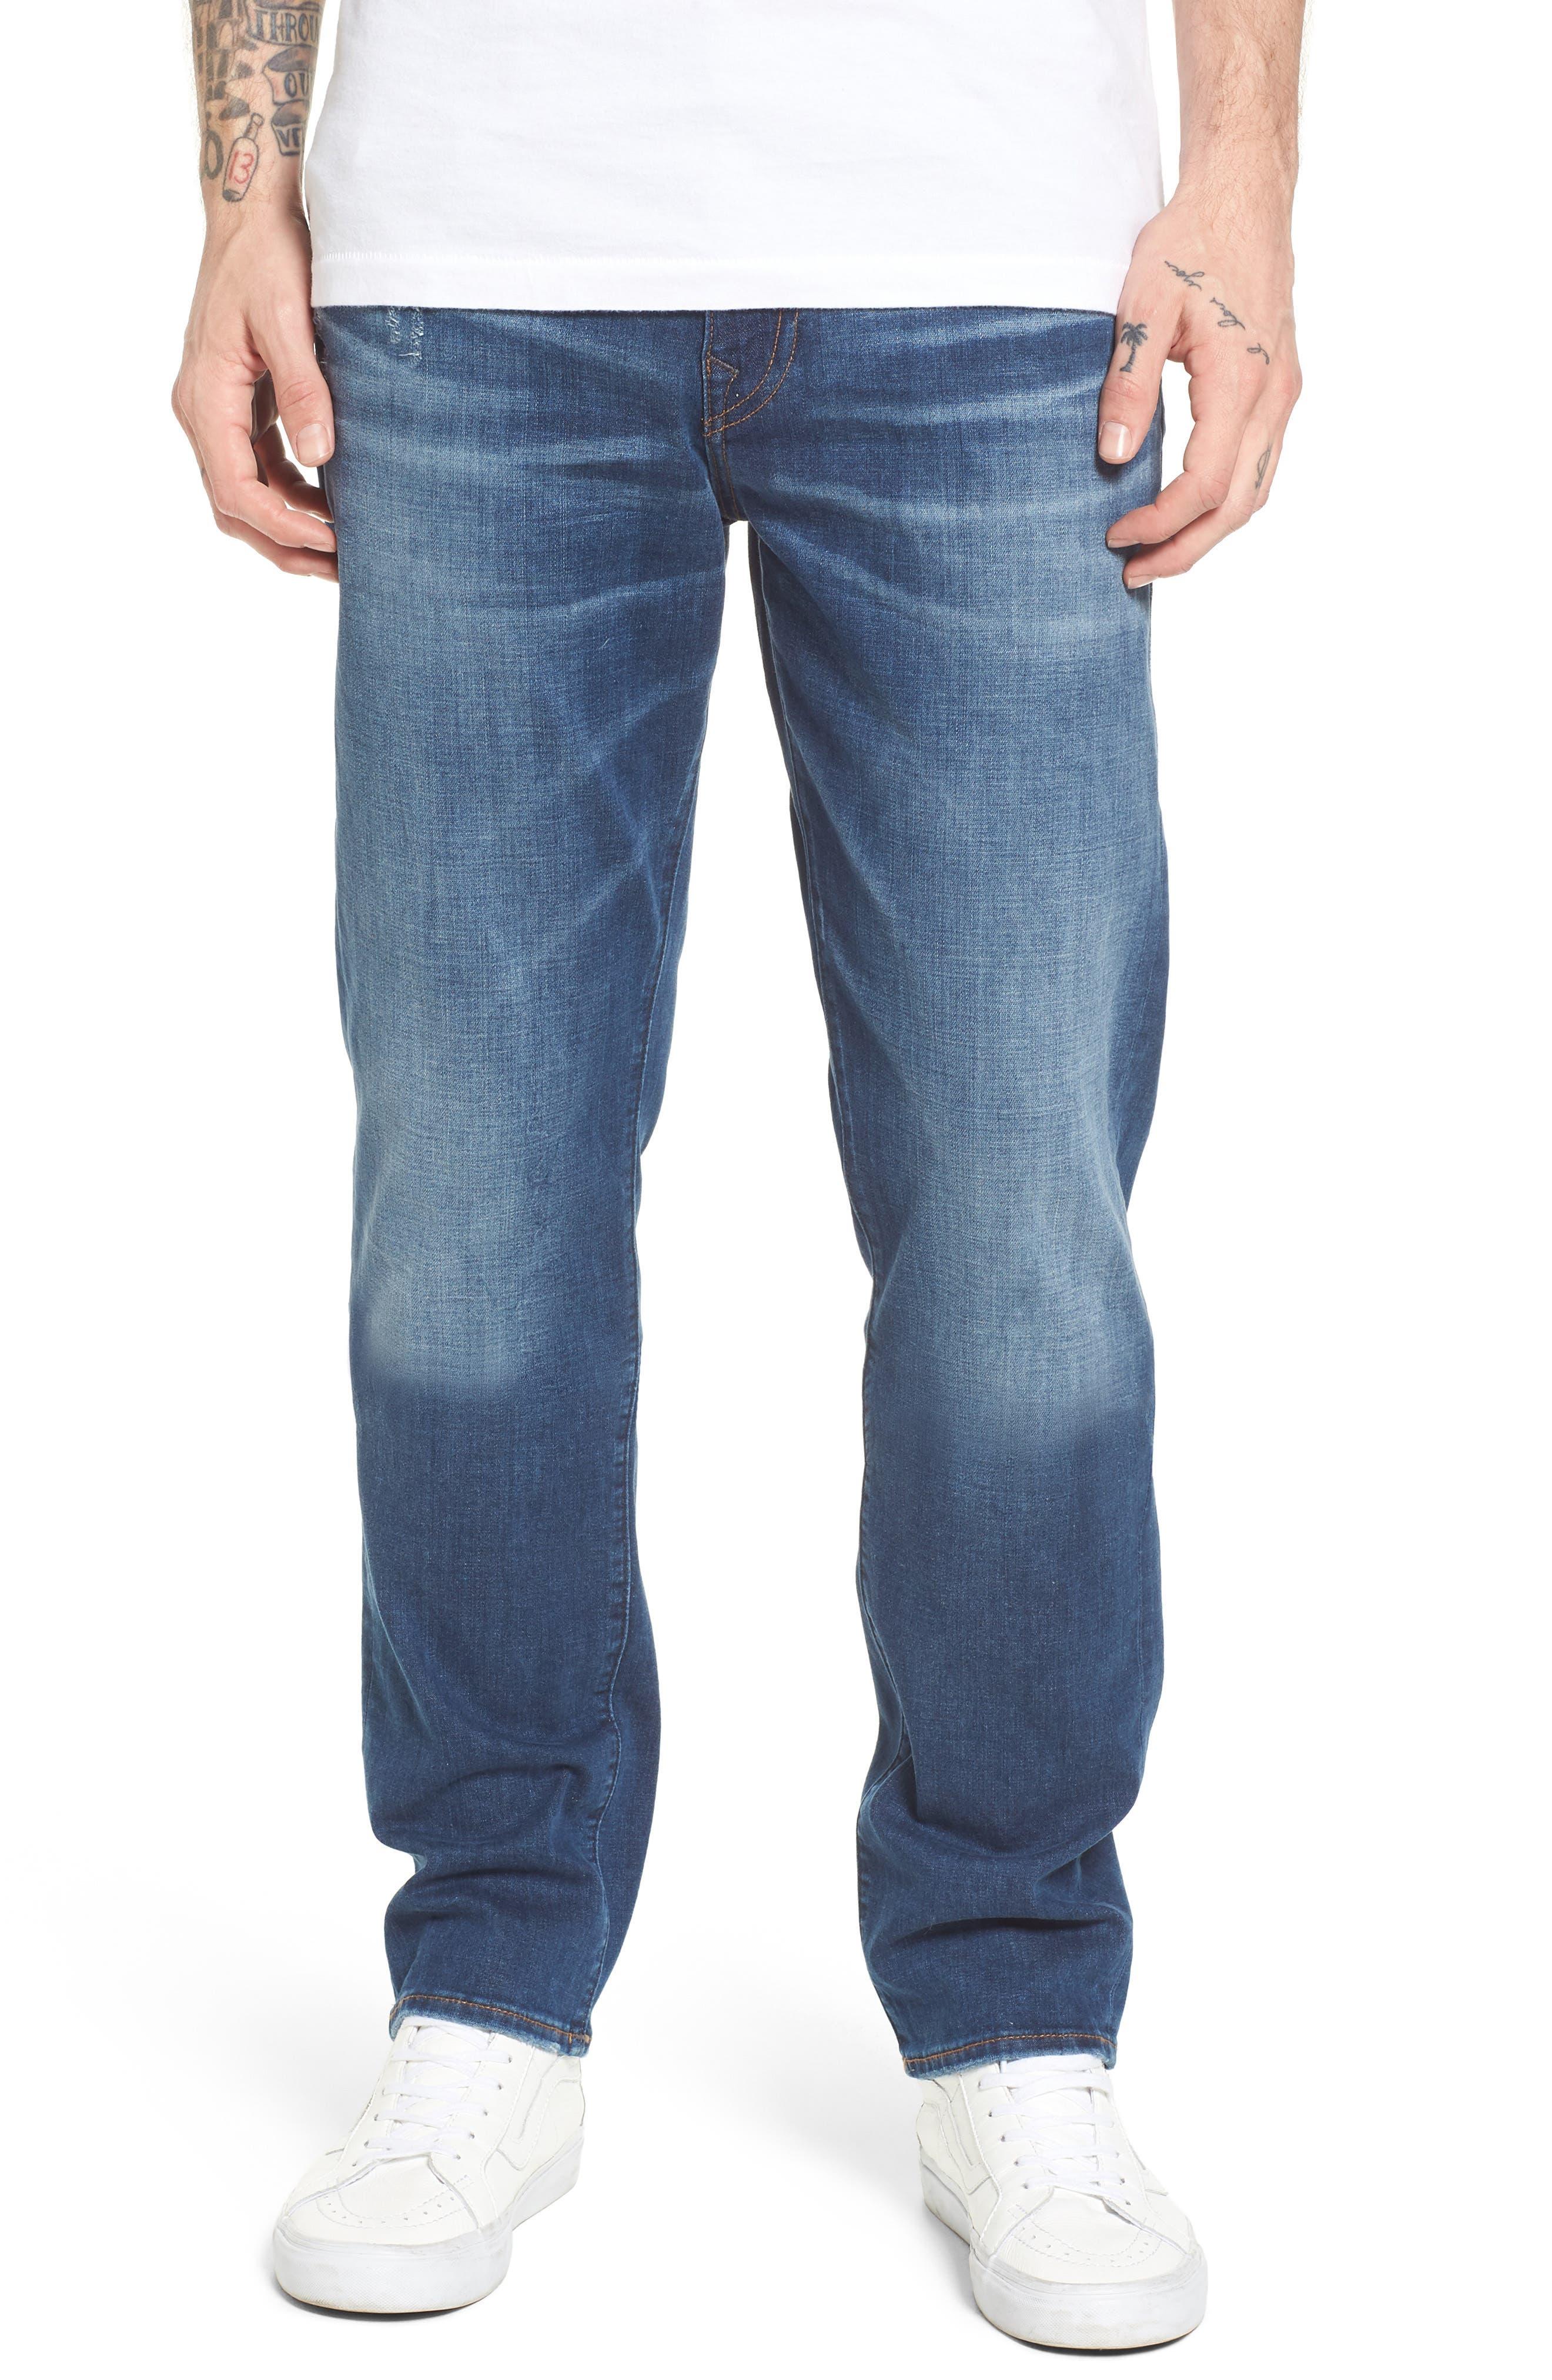 True Religion Brand Jeans Geno Straight Leg Jeans (Street Vice)